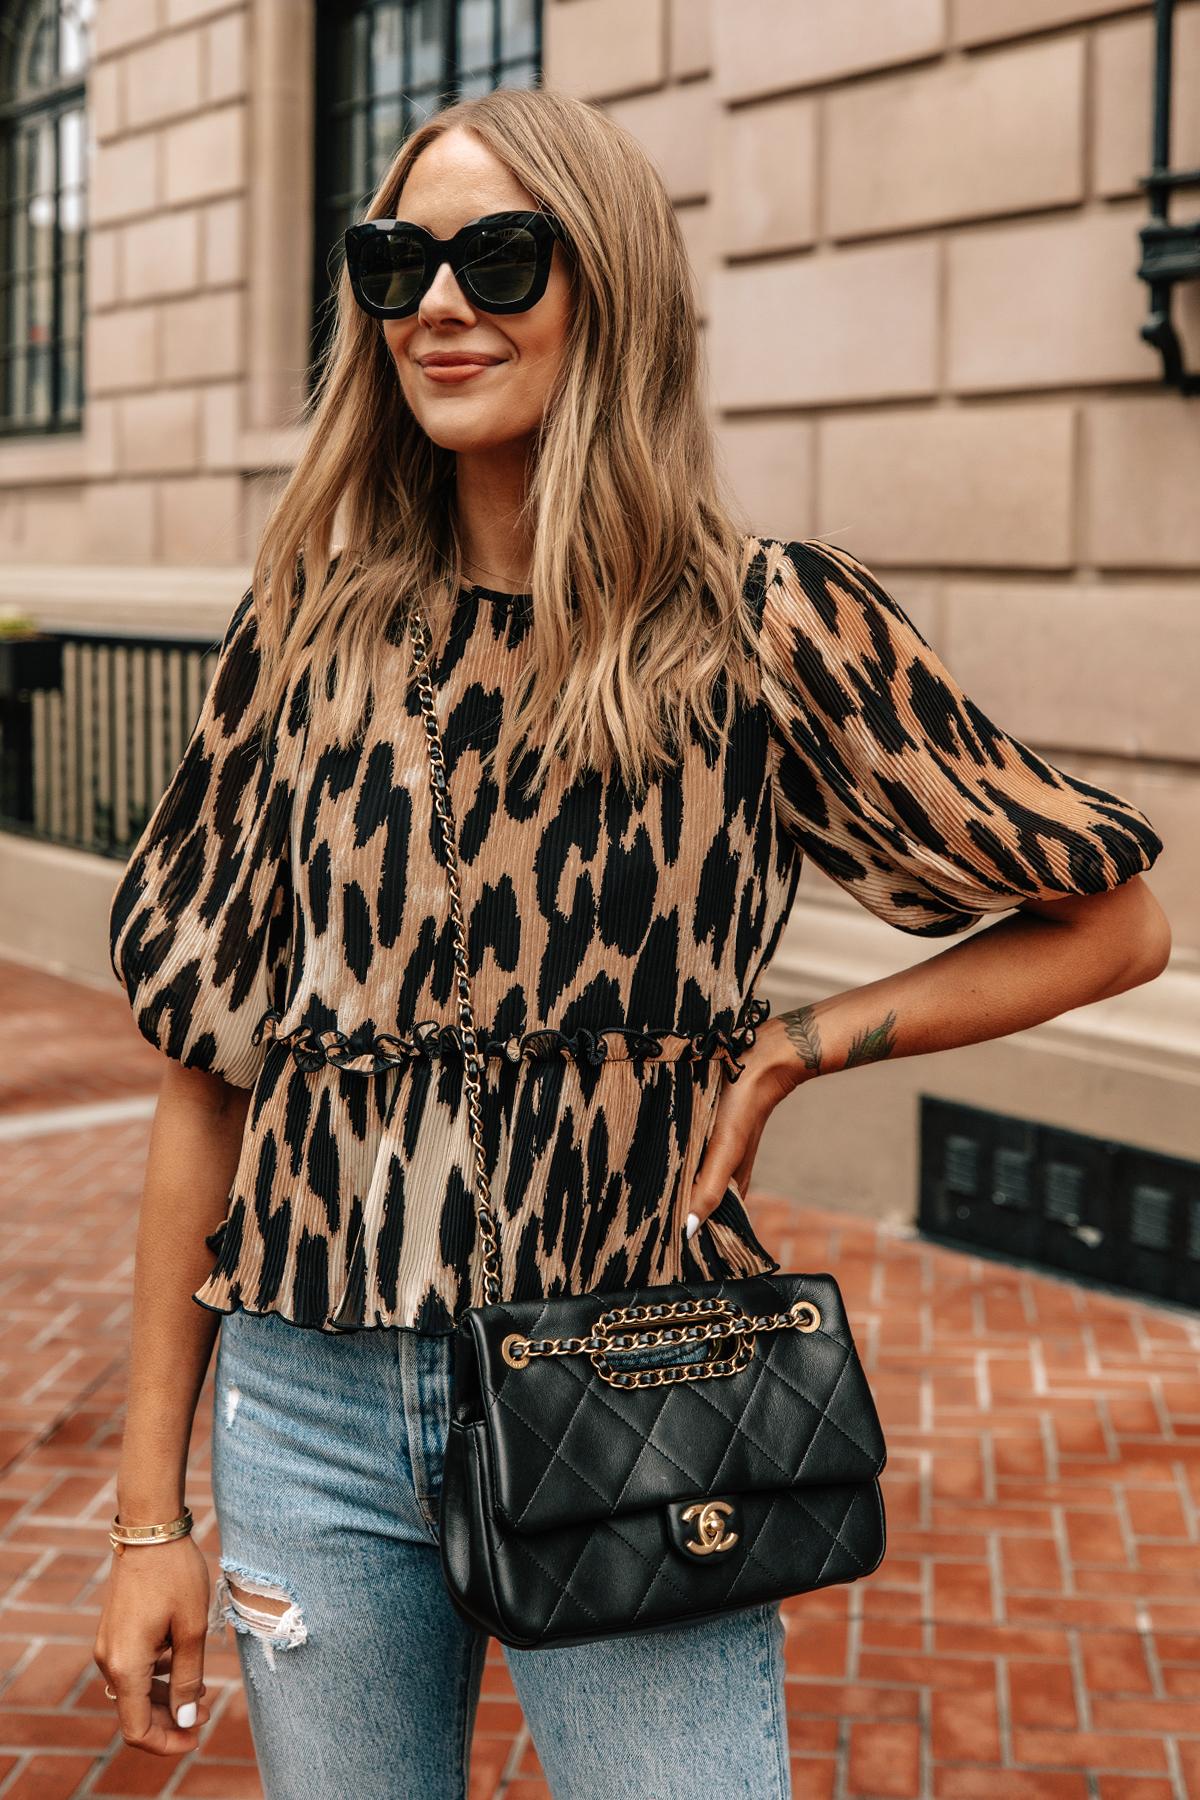 Fashion Jackson Wearing Ganni Leopard Top Levis Ripped Jeans Black Chanel Handbag